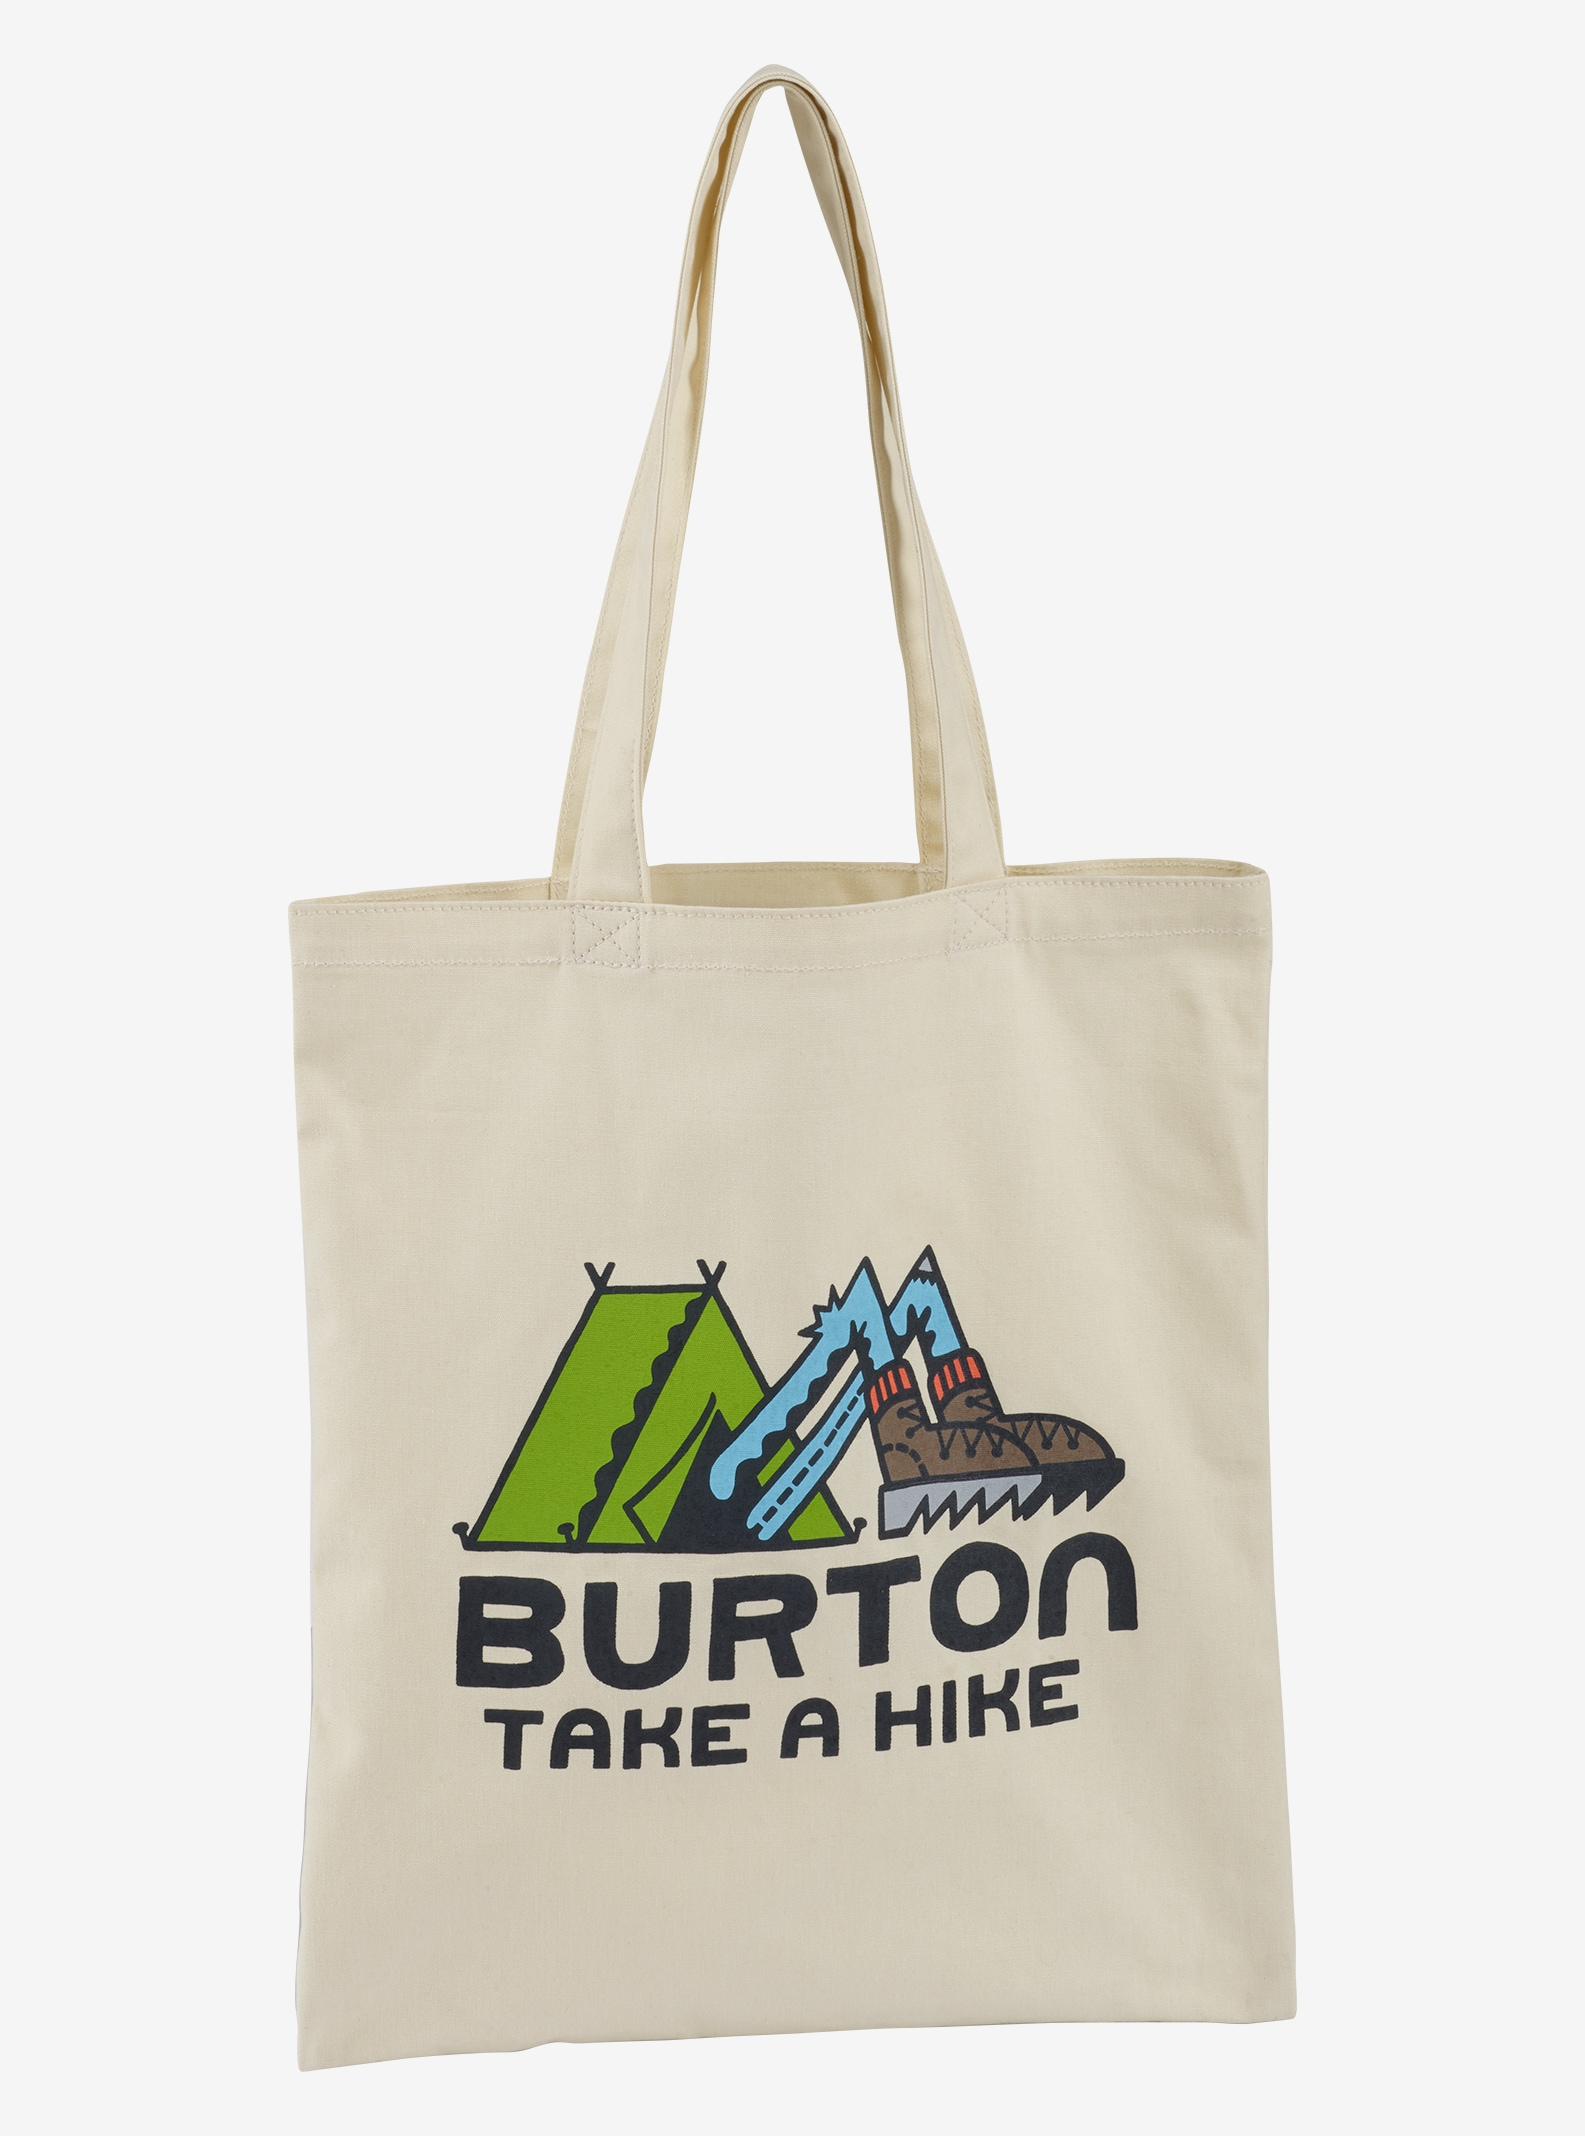 Burton Simple Tote Bag shown in Canvas